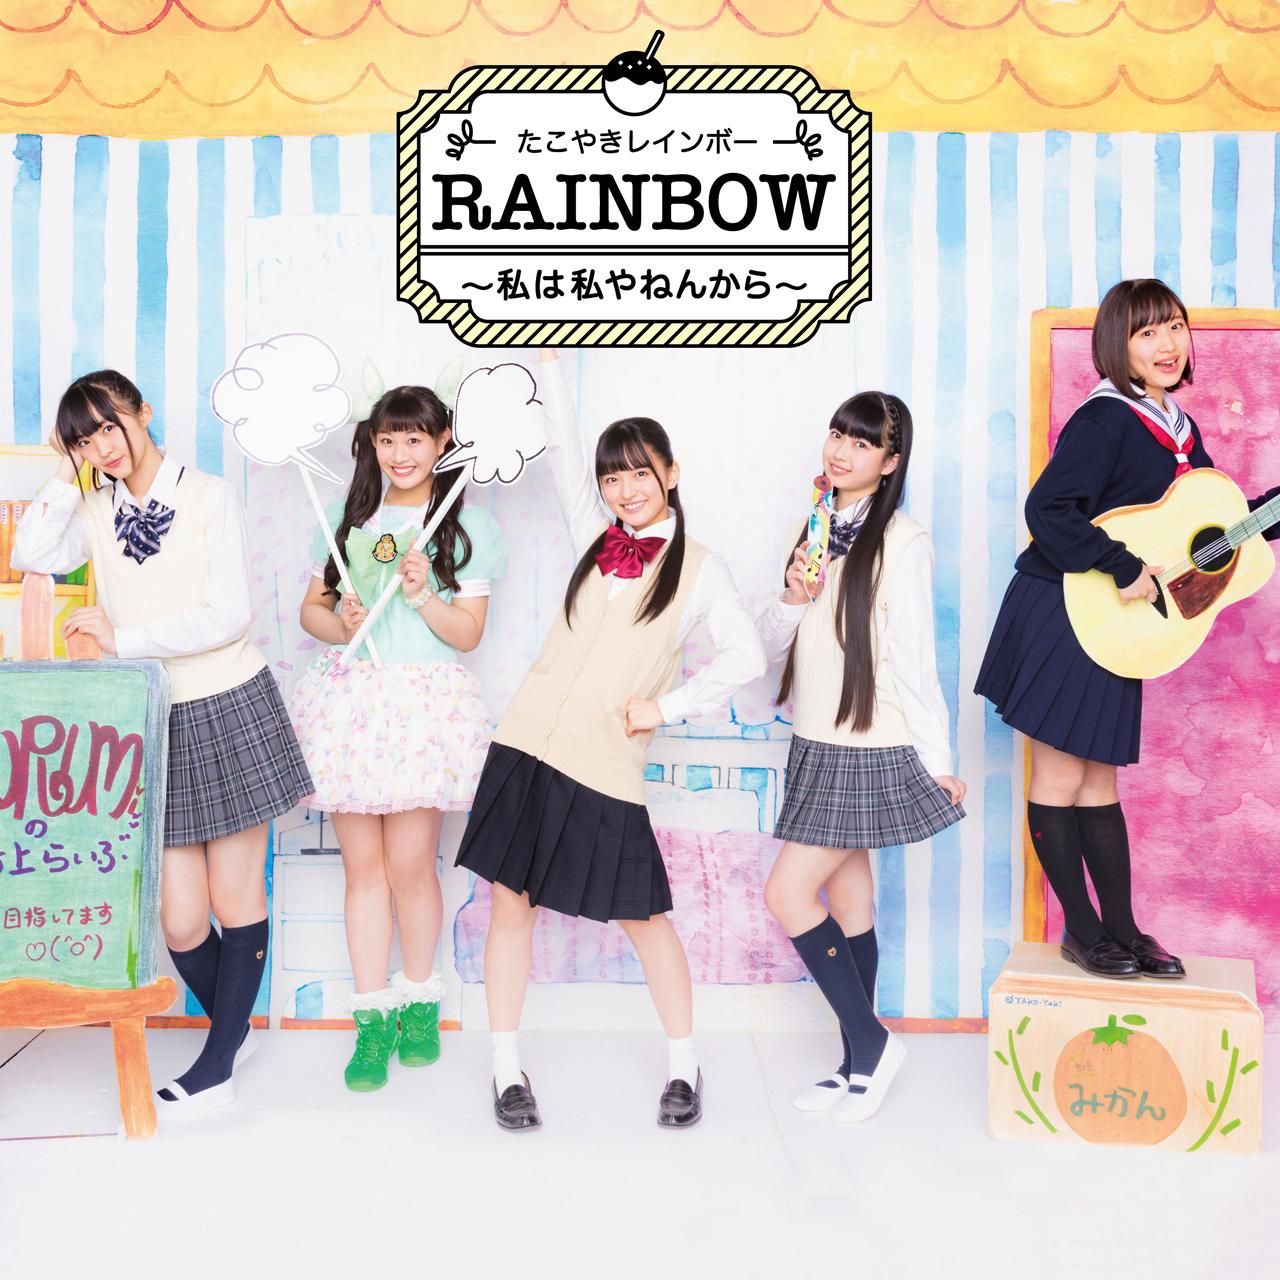 20180203.0241.17 Tacoyaki Rainbow - Rainbow ~Watashi wa Watashi Yanenkara~ cover 1.jpg